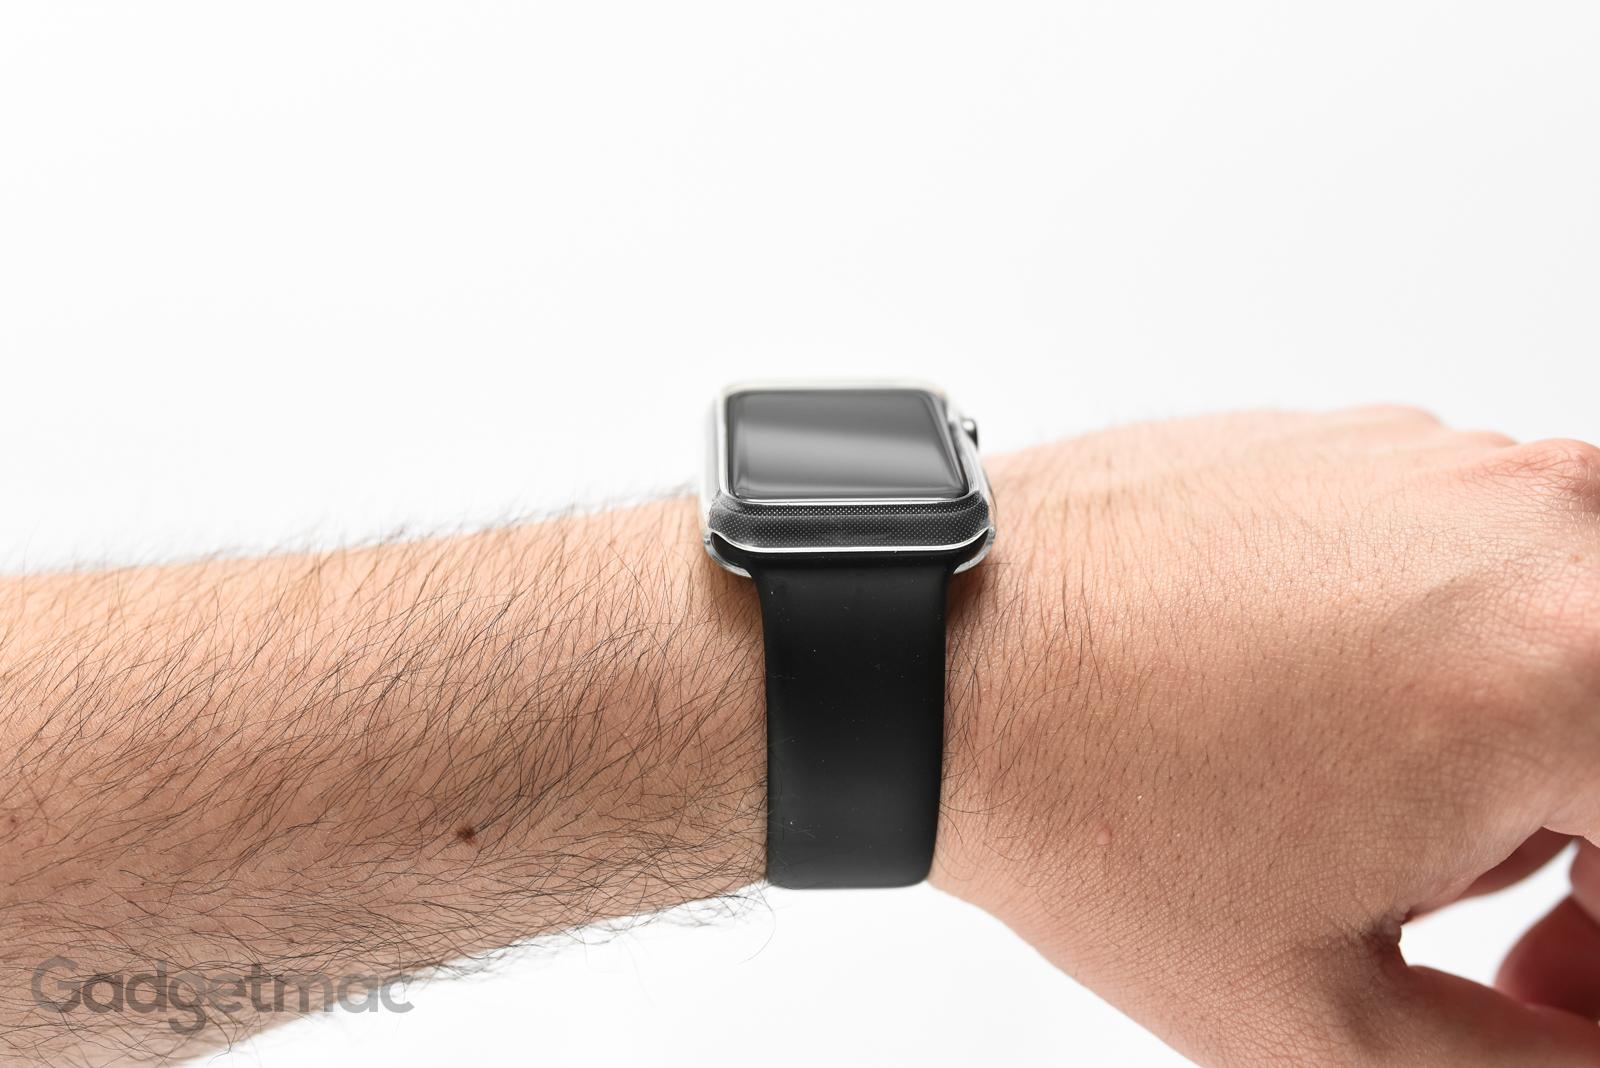 spigen-apple-watch-liquid-crystal-clear-case.jpg